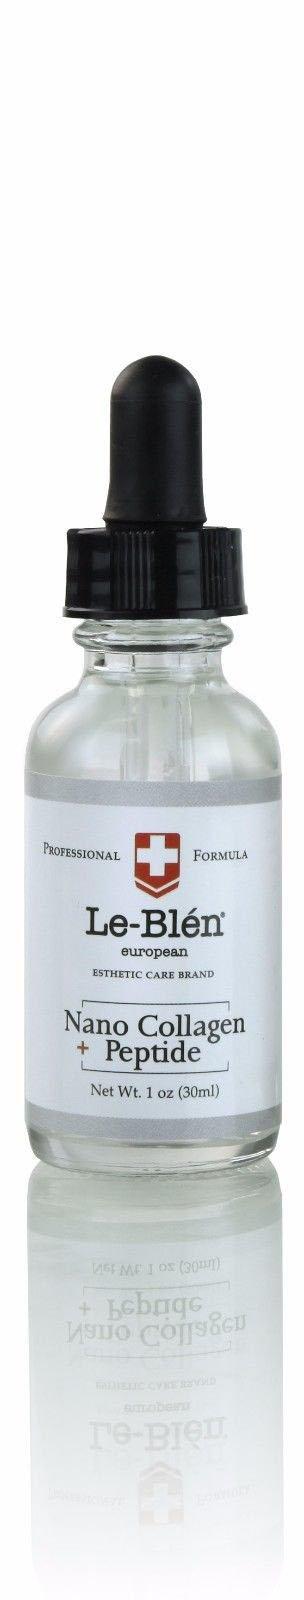 Le-Blen european ESTHETIC CARE BRAND - Nano Collagen Peptide (1oz)